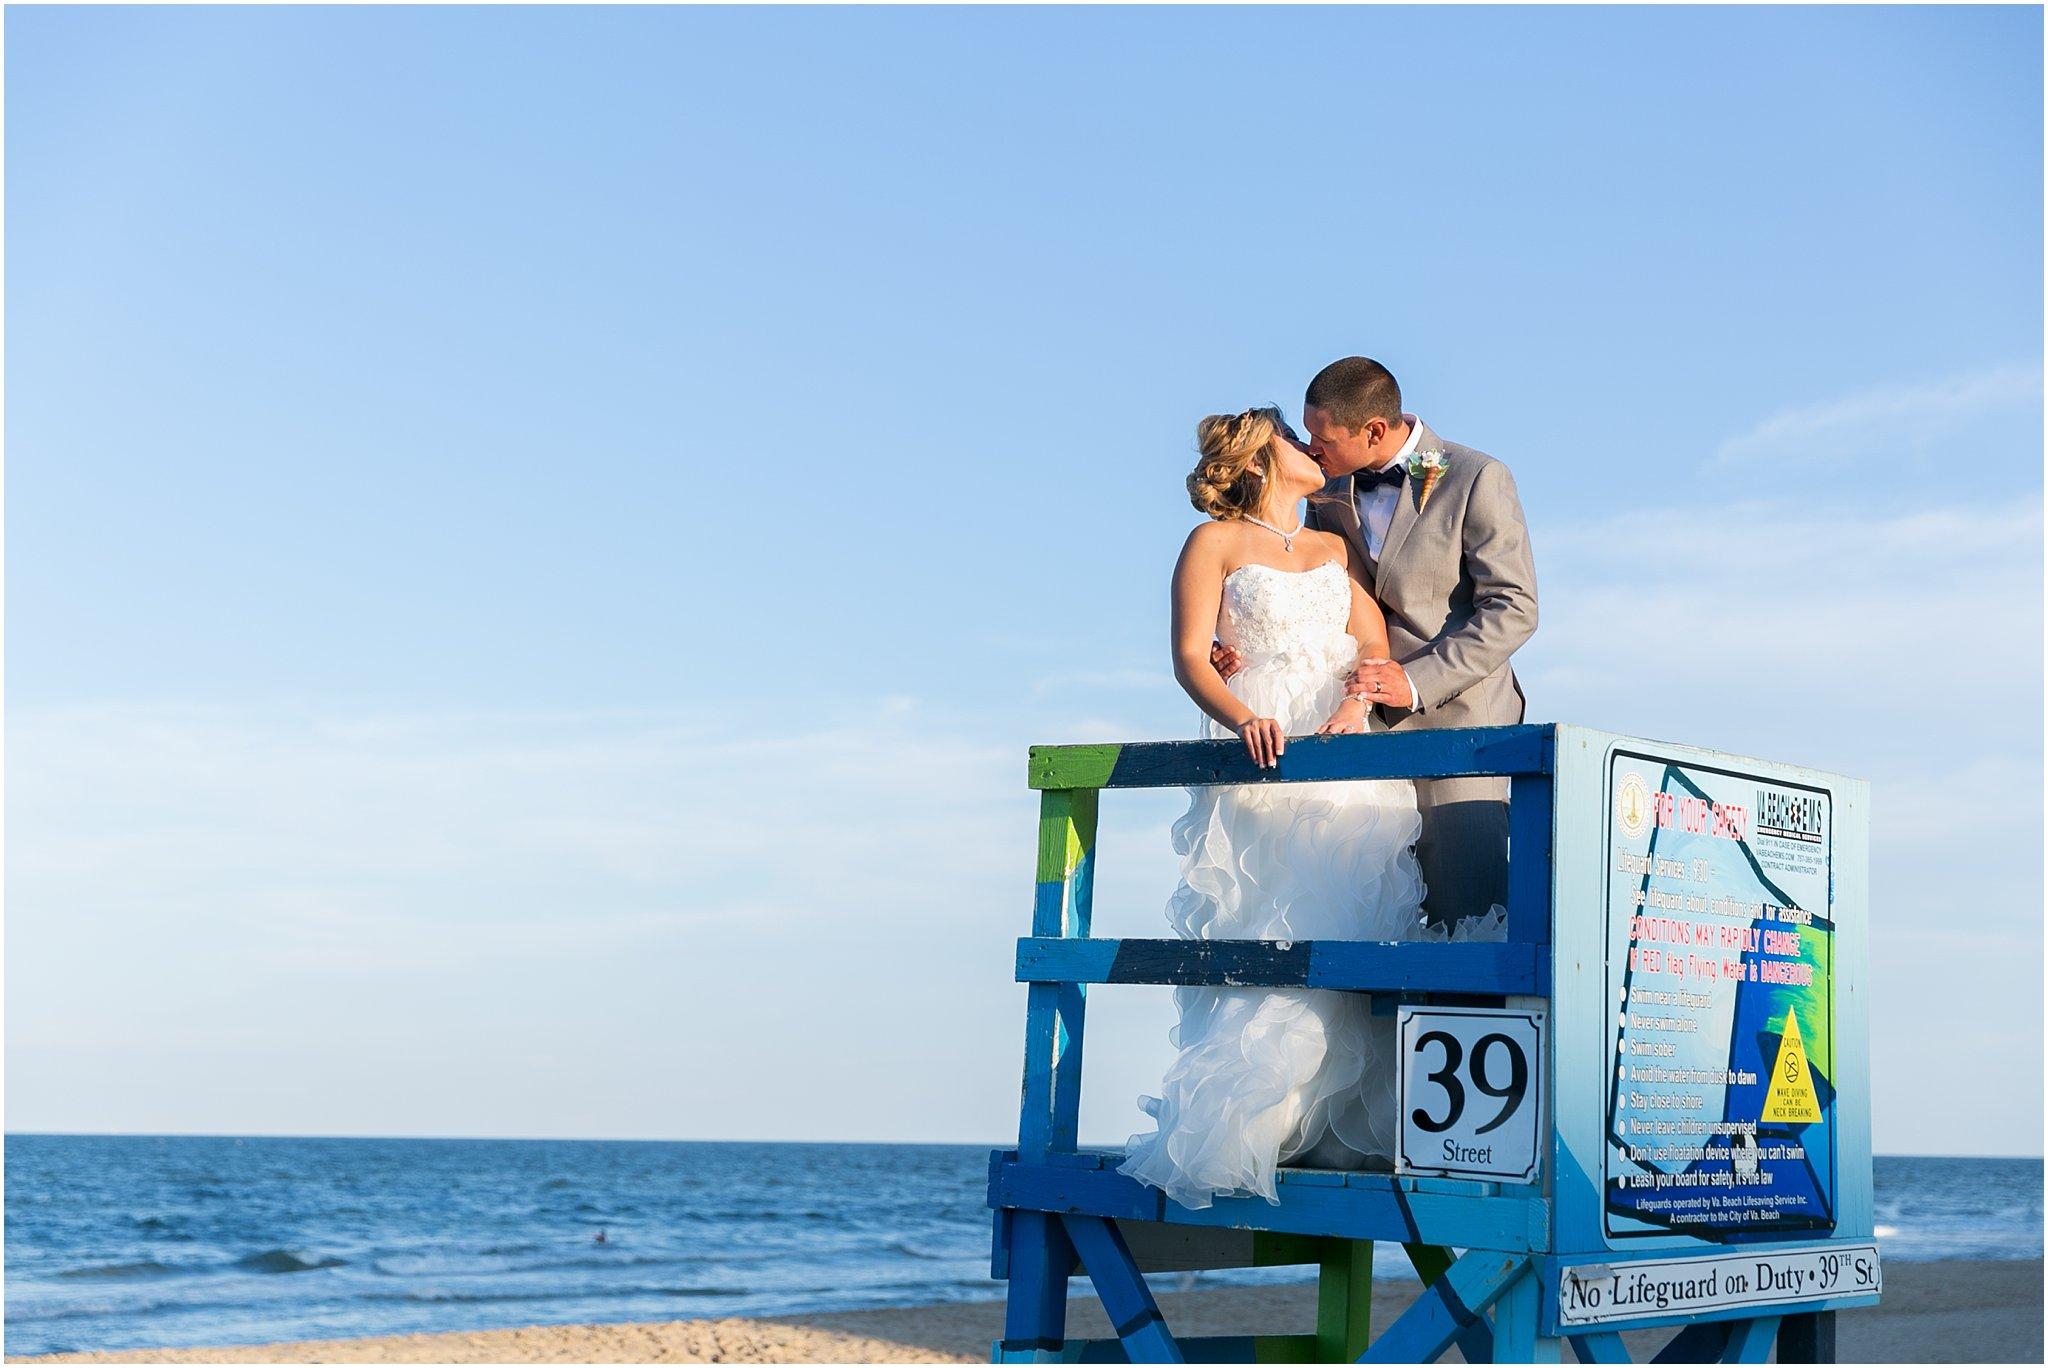 jessica_ryan_photography_wedding_hampton_roads_virginia_virginia_beach_weddings_0626